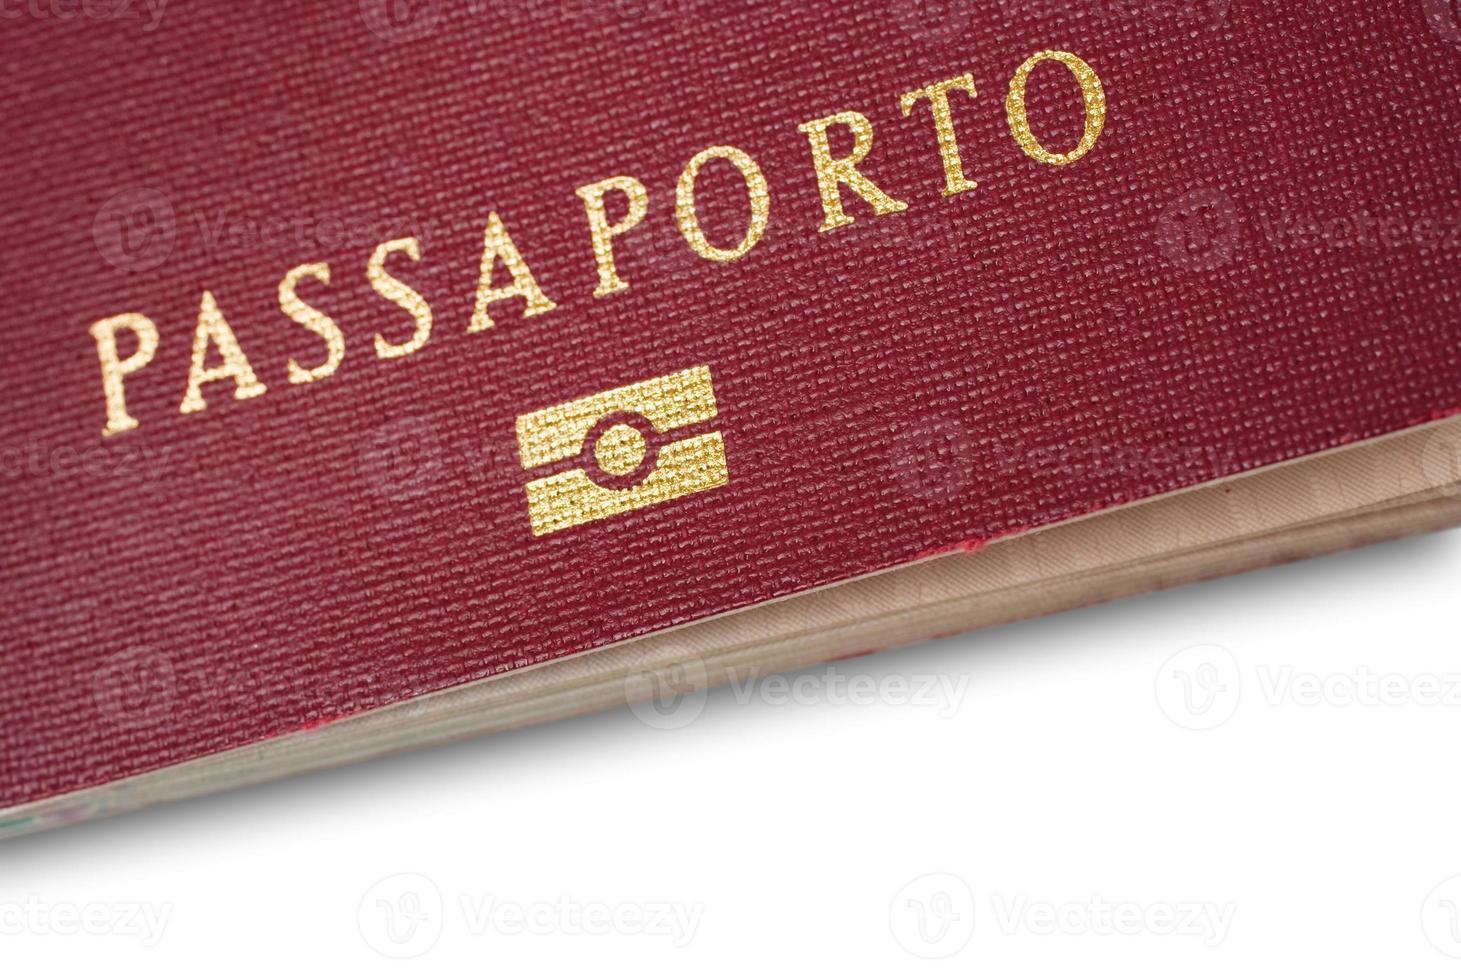 italienische Pass Nahaufnahme foto